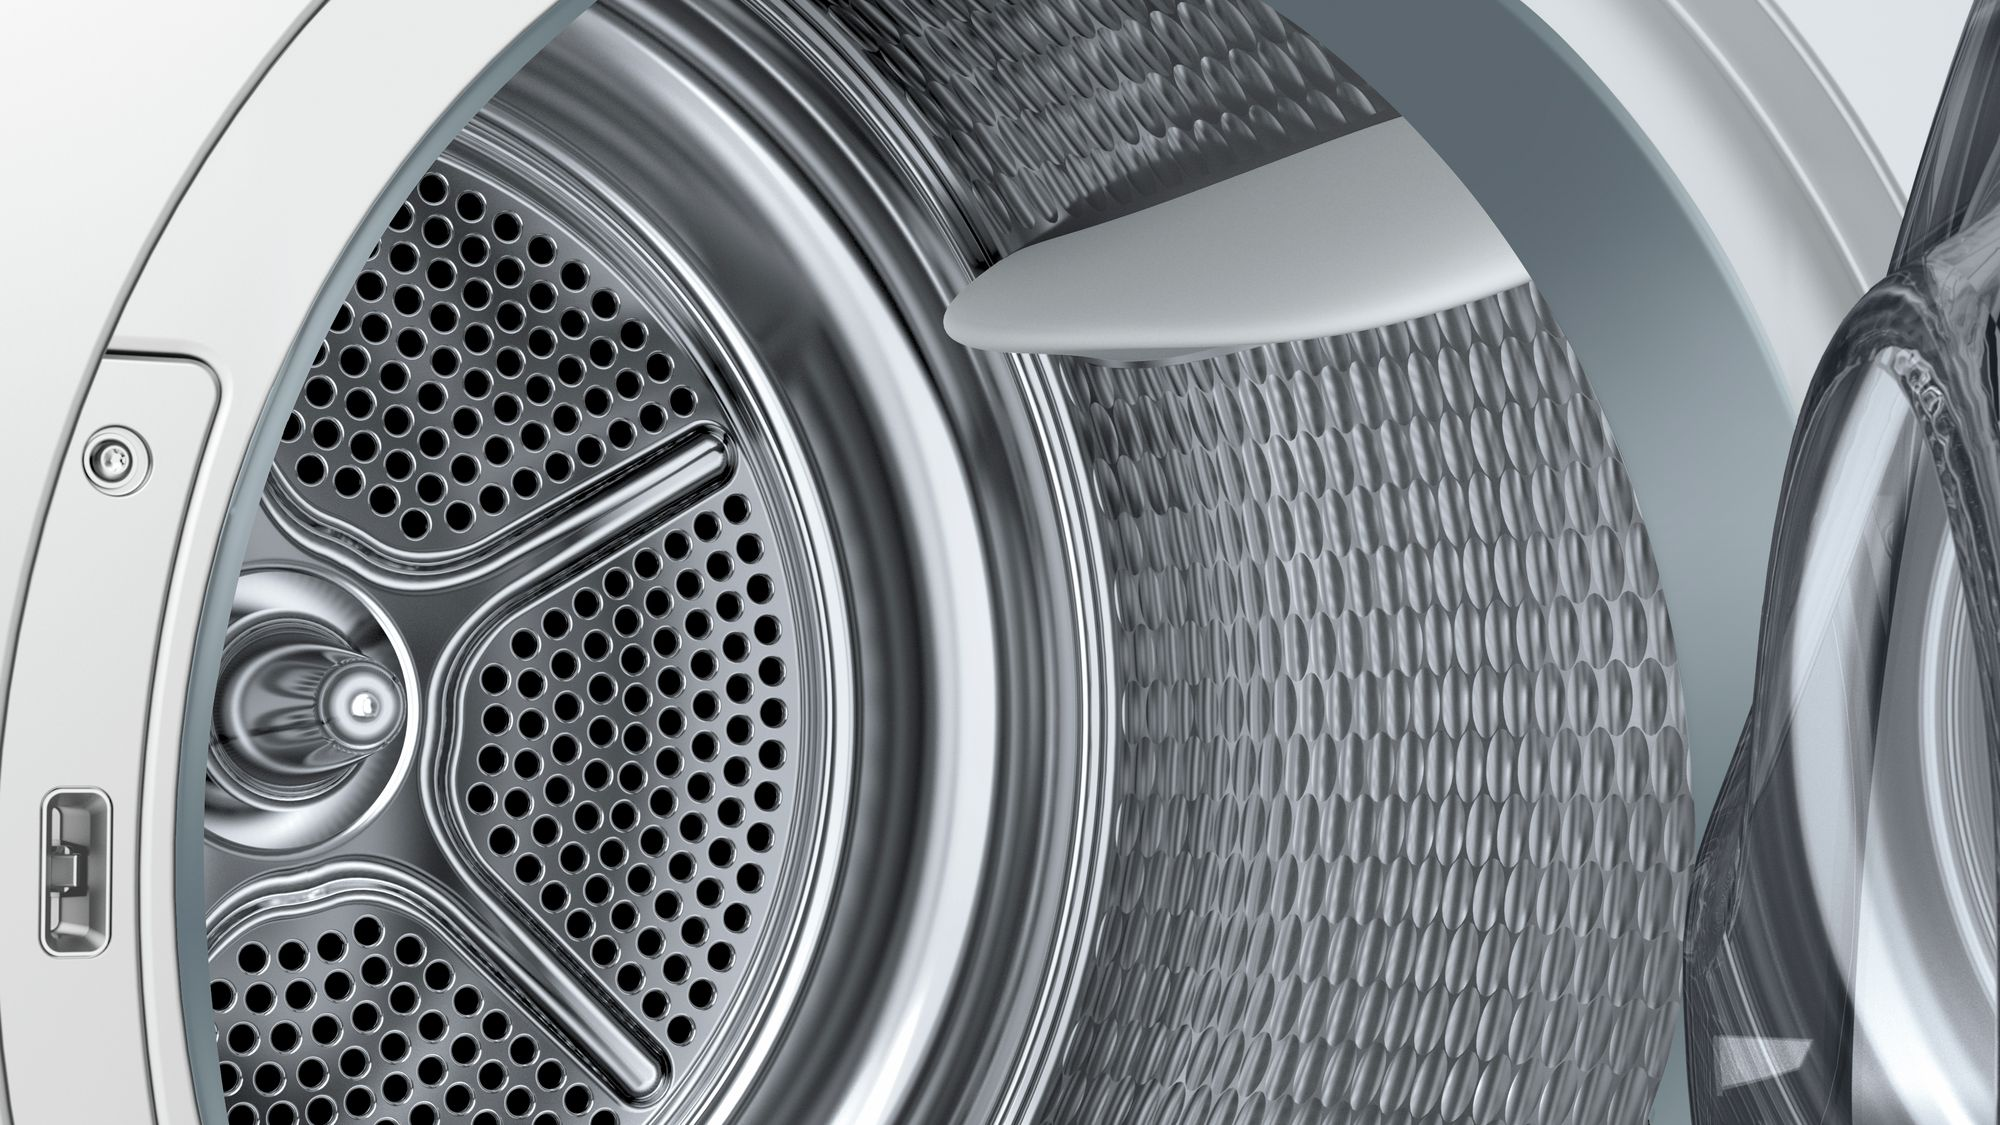 Bosch serie 8 selfcleaning condenser wärmepumpentrockner wtwh7540